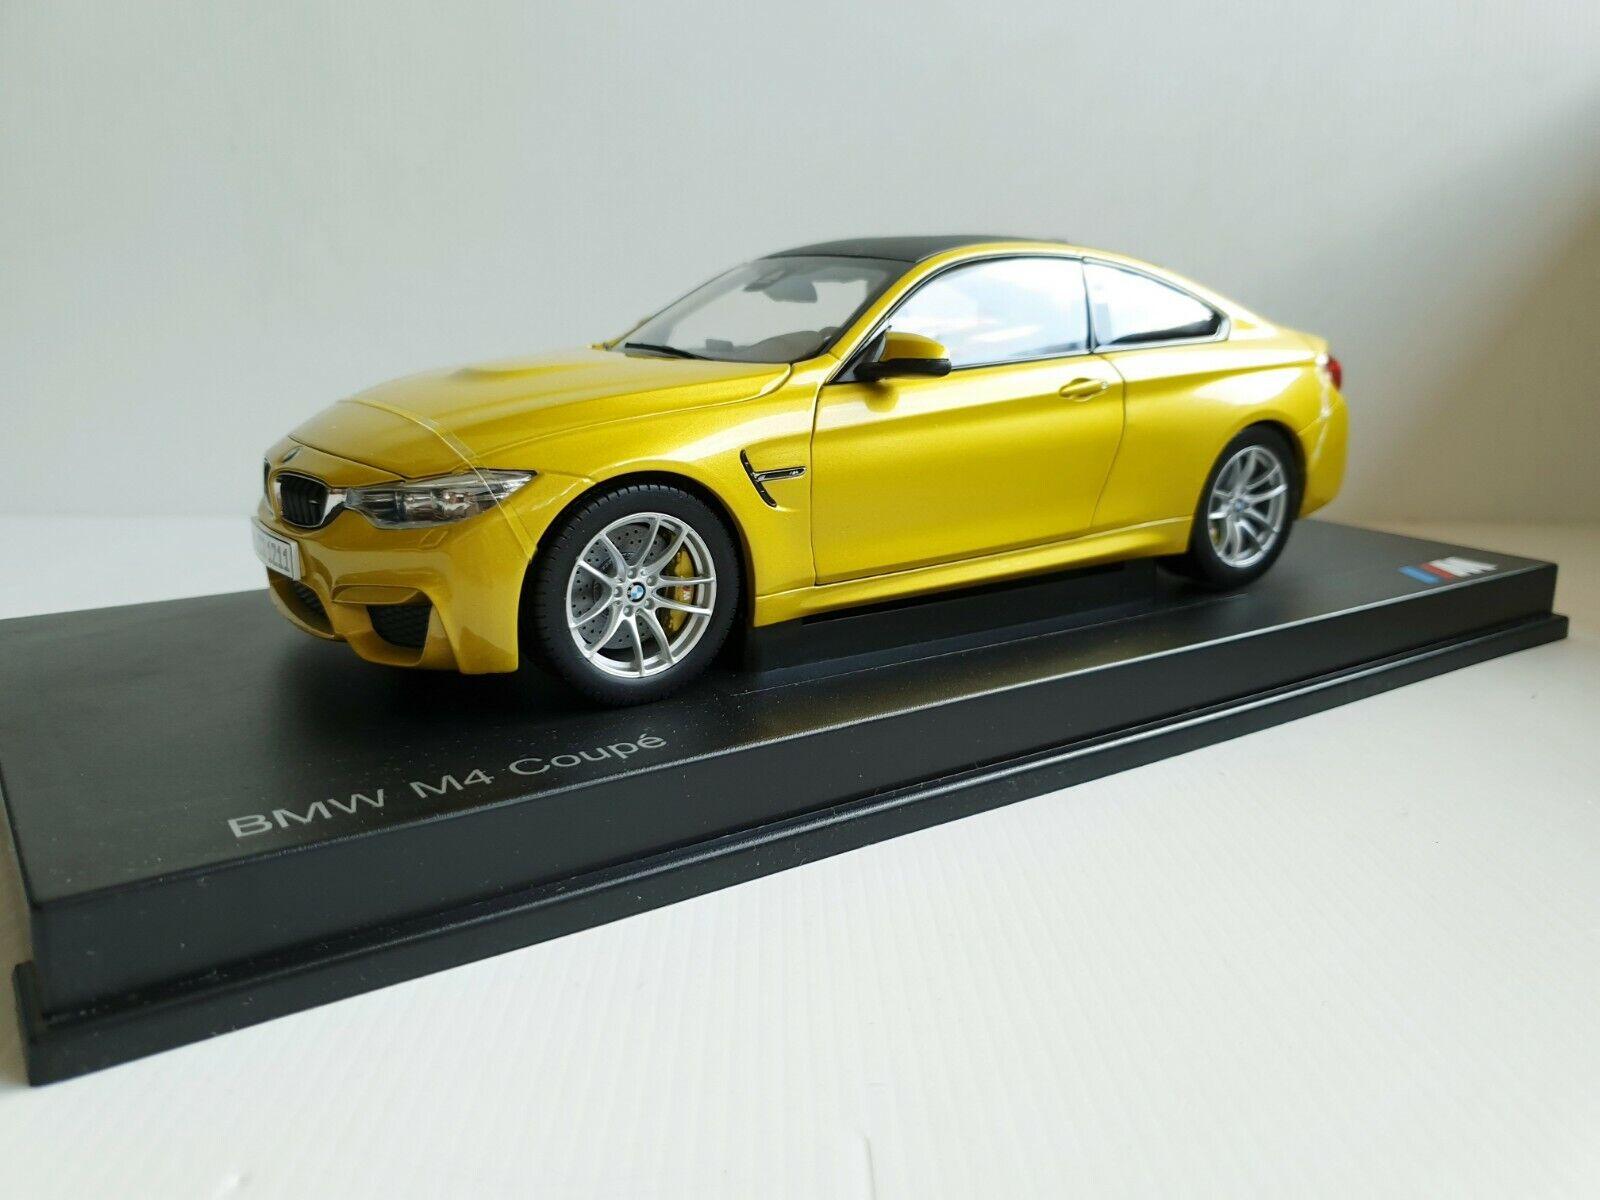 fabbrica diretta BMW M4 F82 Coupe 1 18 gituttio Austin gituttio gituttio gituttio Paragon DEALER  vendita scontata